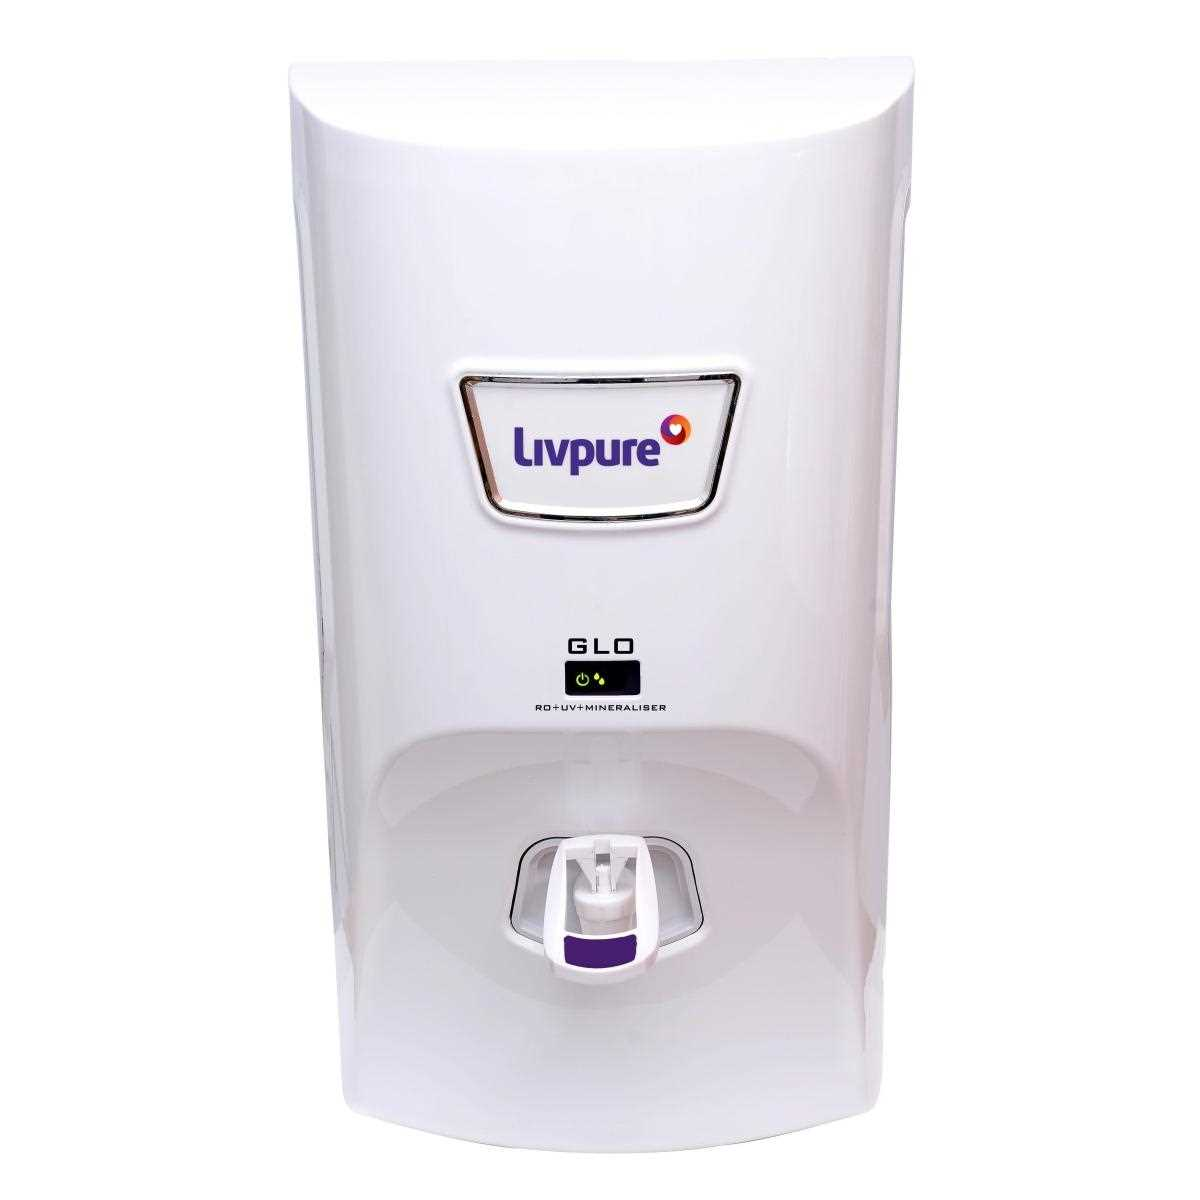 Livpure GLO 7 L RO UV Water Purifier